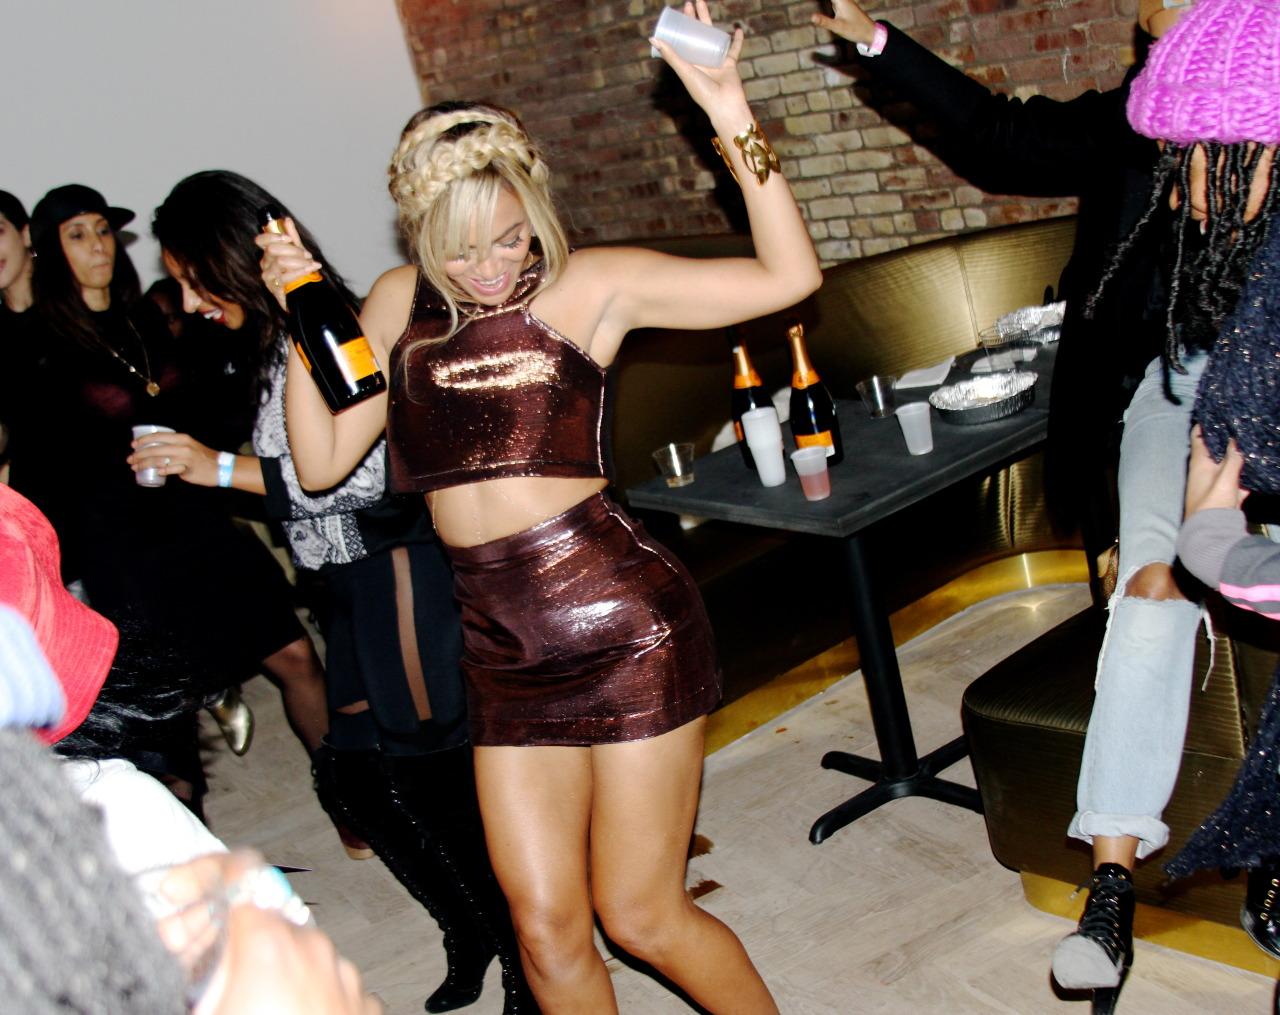 Beyoncé - Twitter (@Beyonce), Instagram (Baddiebey), Tumblr (I Am...) [II] - Página 3 Tumblr_n0yzxgYQxl1rqgjz2o1_1280